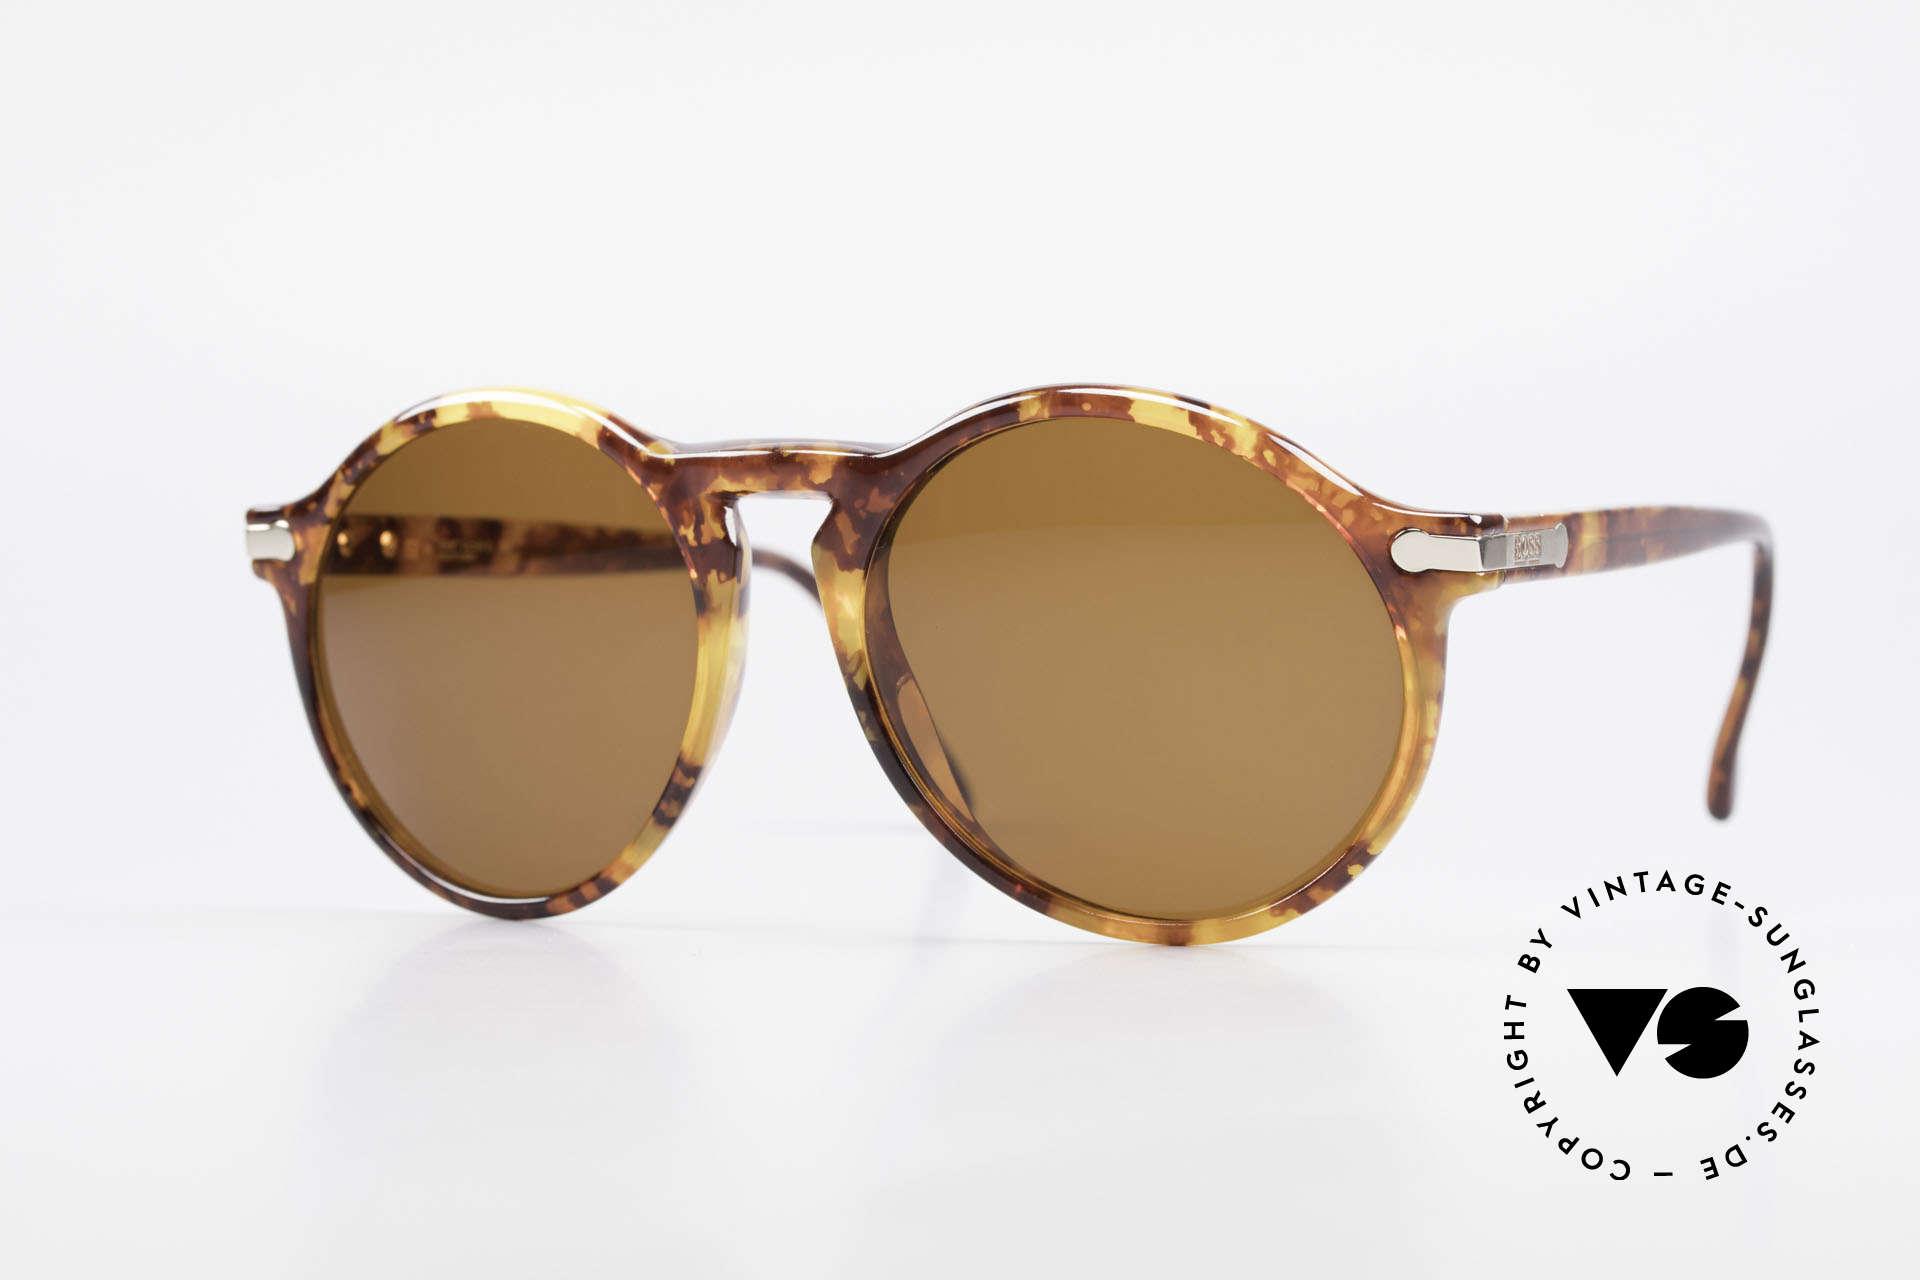 BOSS 5160 Big Panto 90's Sunglasses, classic men's 90's designer sunglasses by BOSS, Made for Men